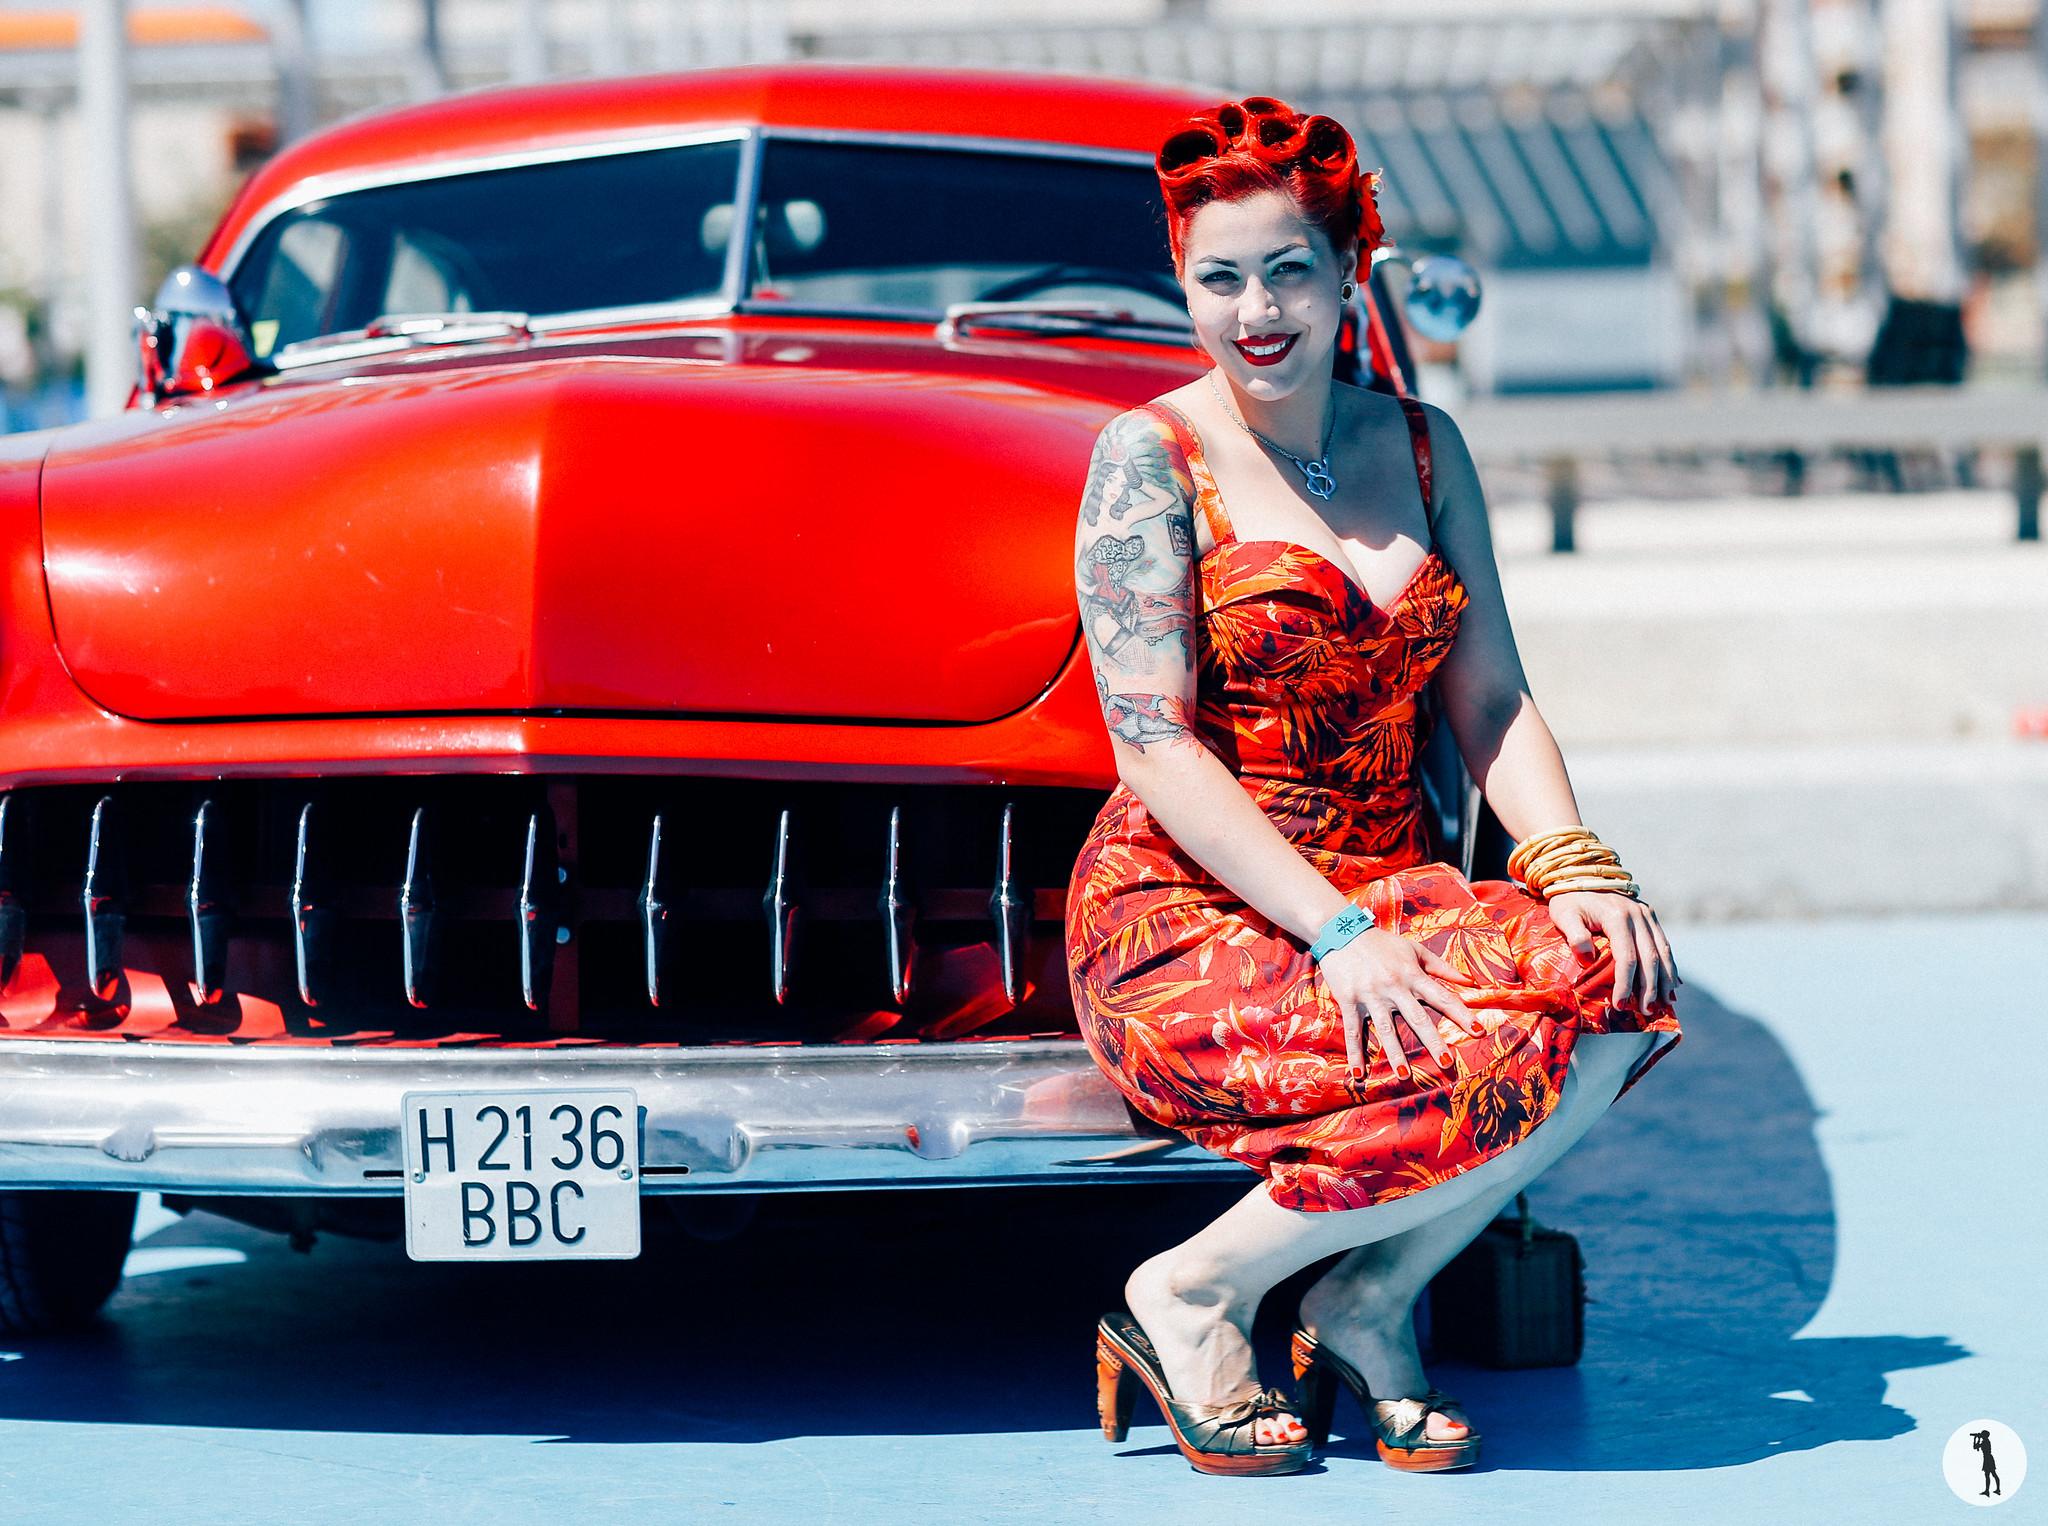 Riverside Car Show 2016, Calafell, Spain. Pin-up. Rockabilly.